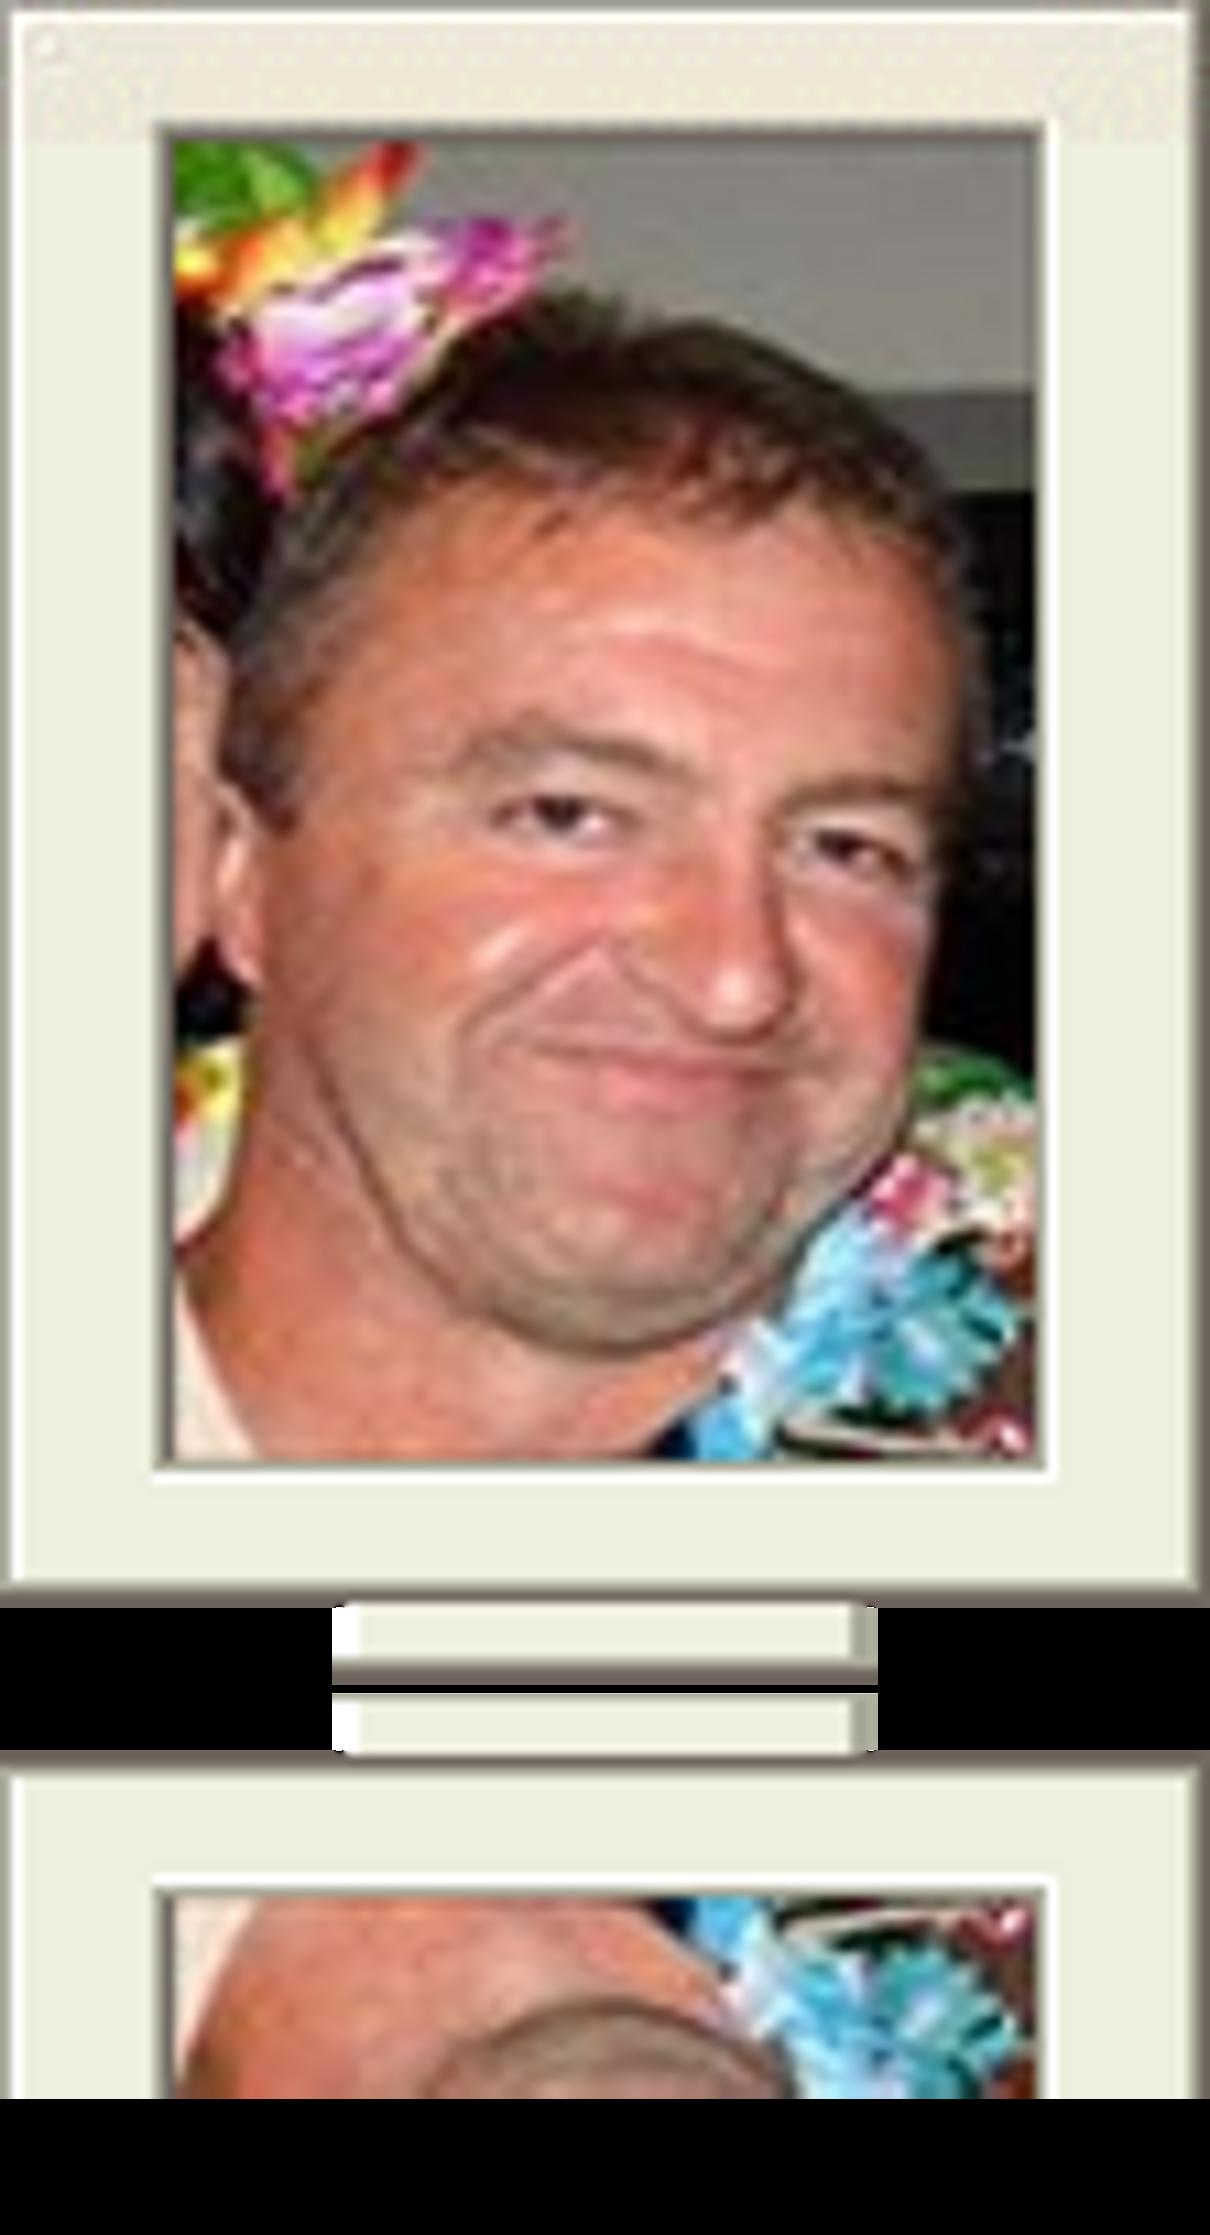 Complaint-review: John Pyke-Nott - Extortionist and conman. Photo #2